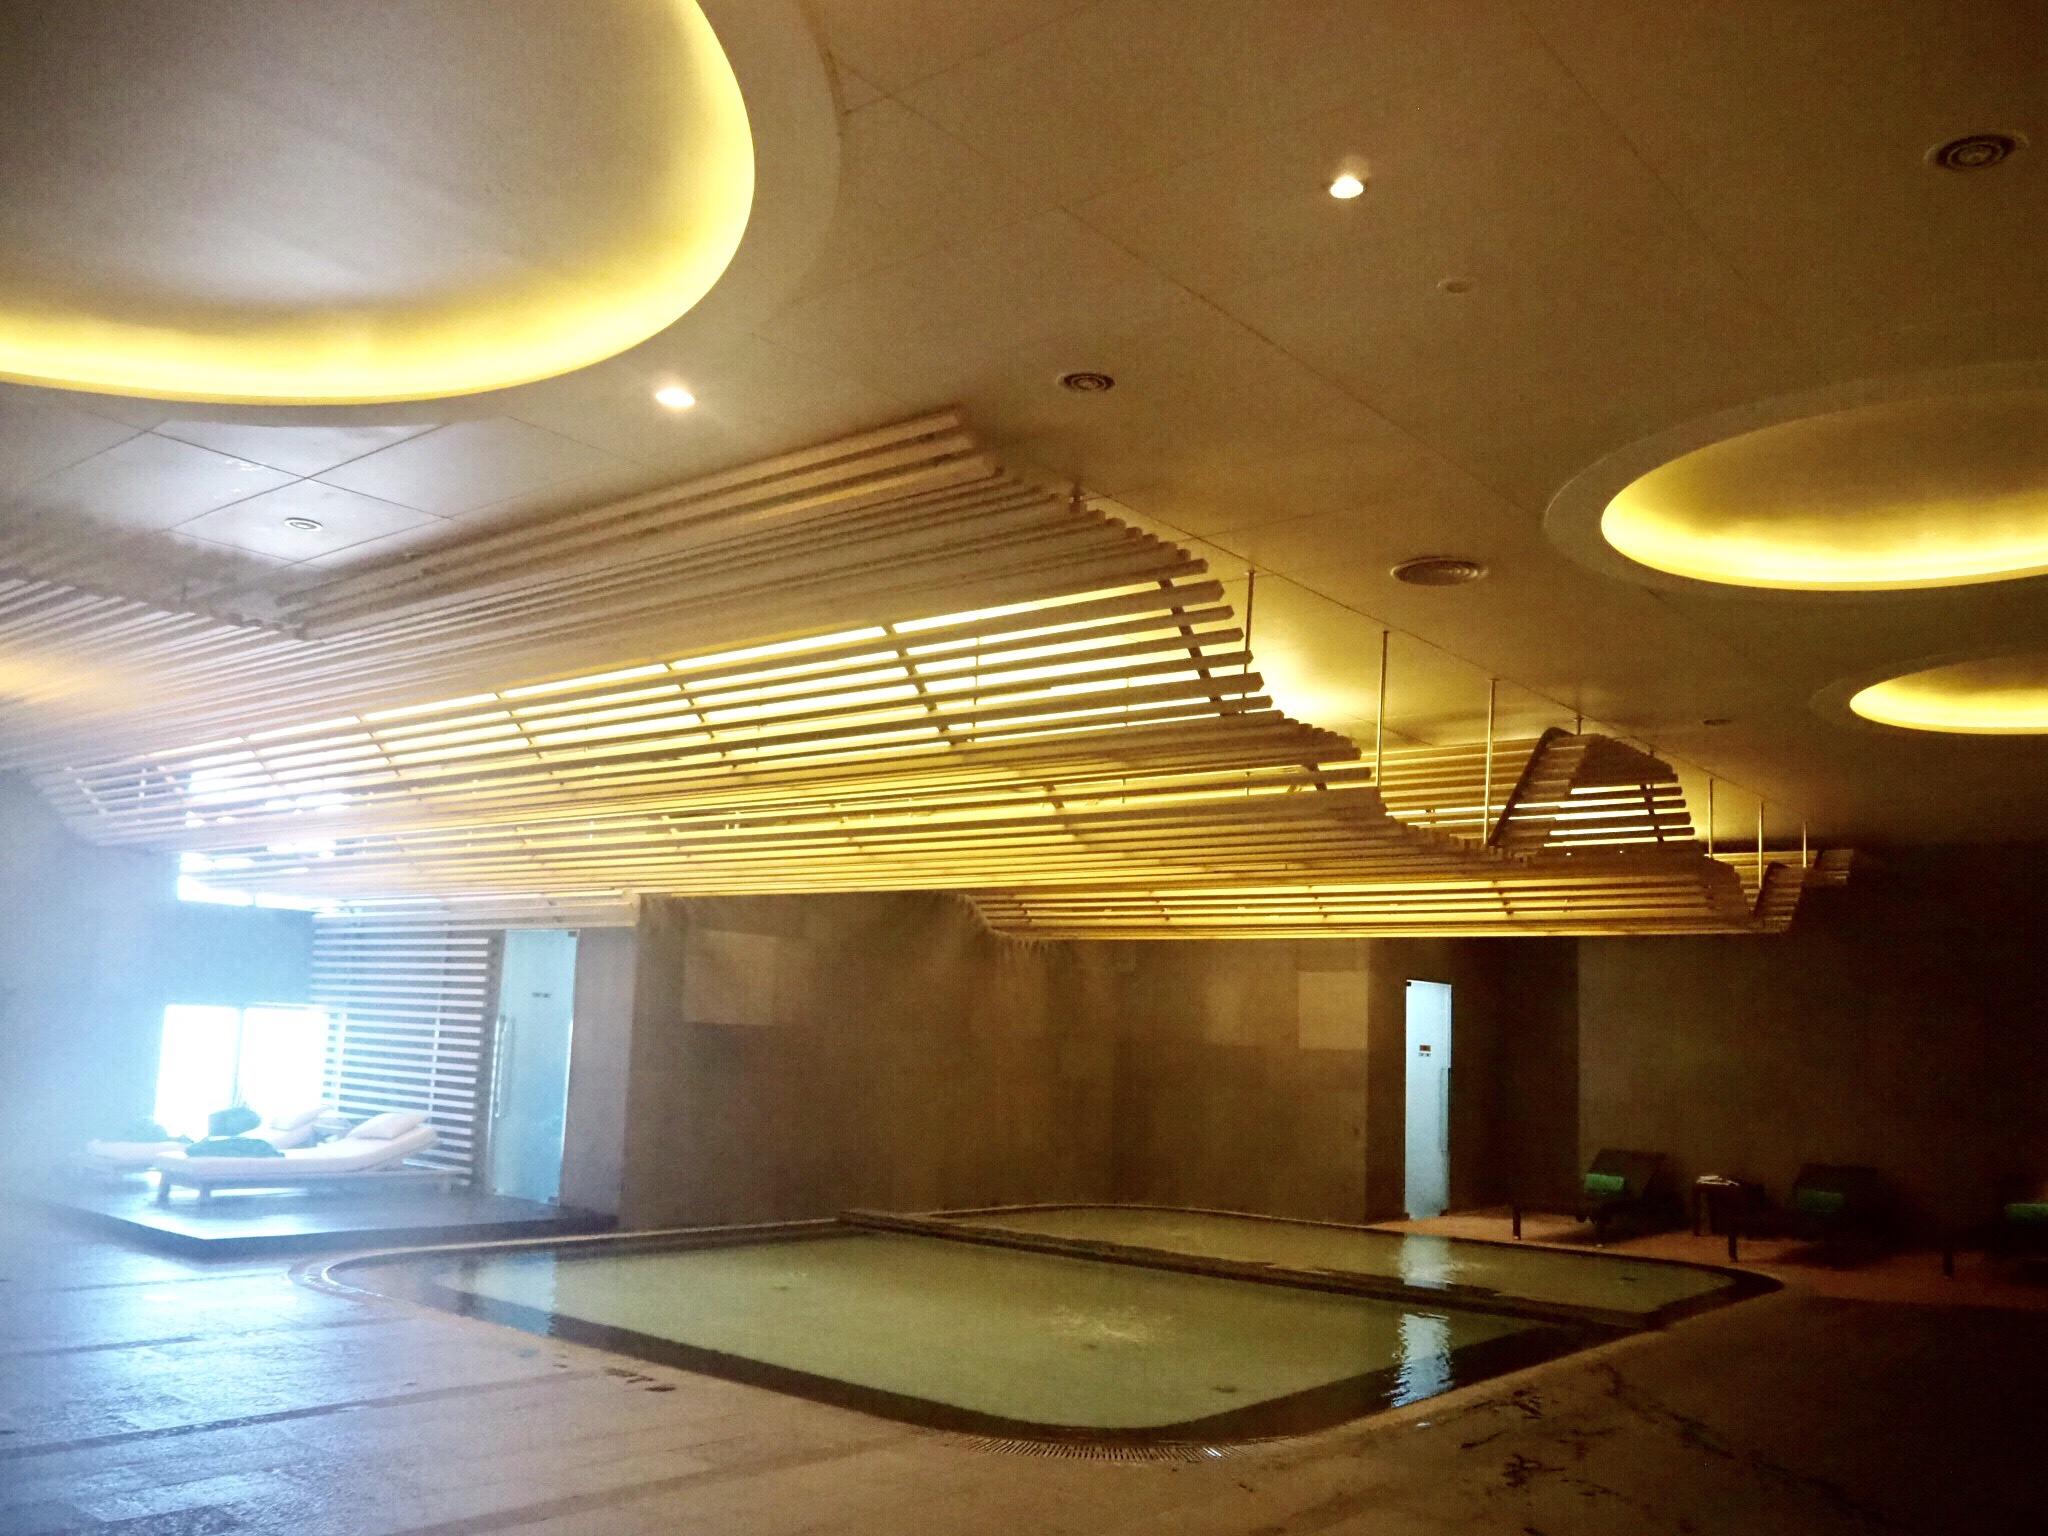 img 7815 - Banyan Tree Club & Spa Seoul - リピーターにお勧めしたい韓国ソウルのちょっと贅沢なステイ先